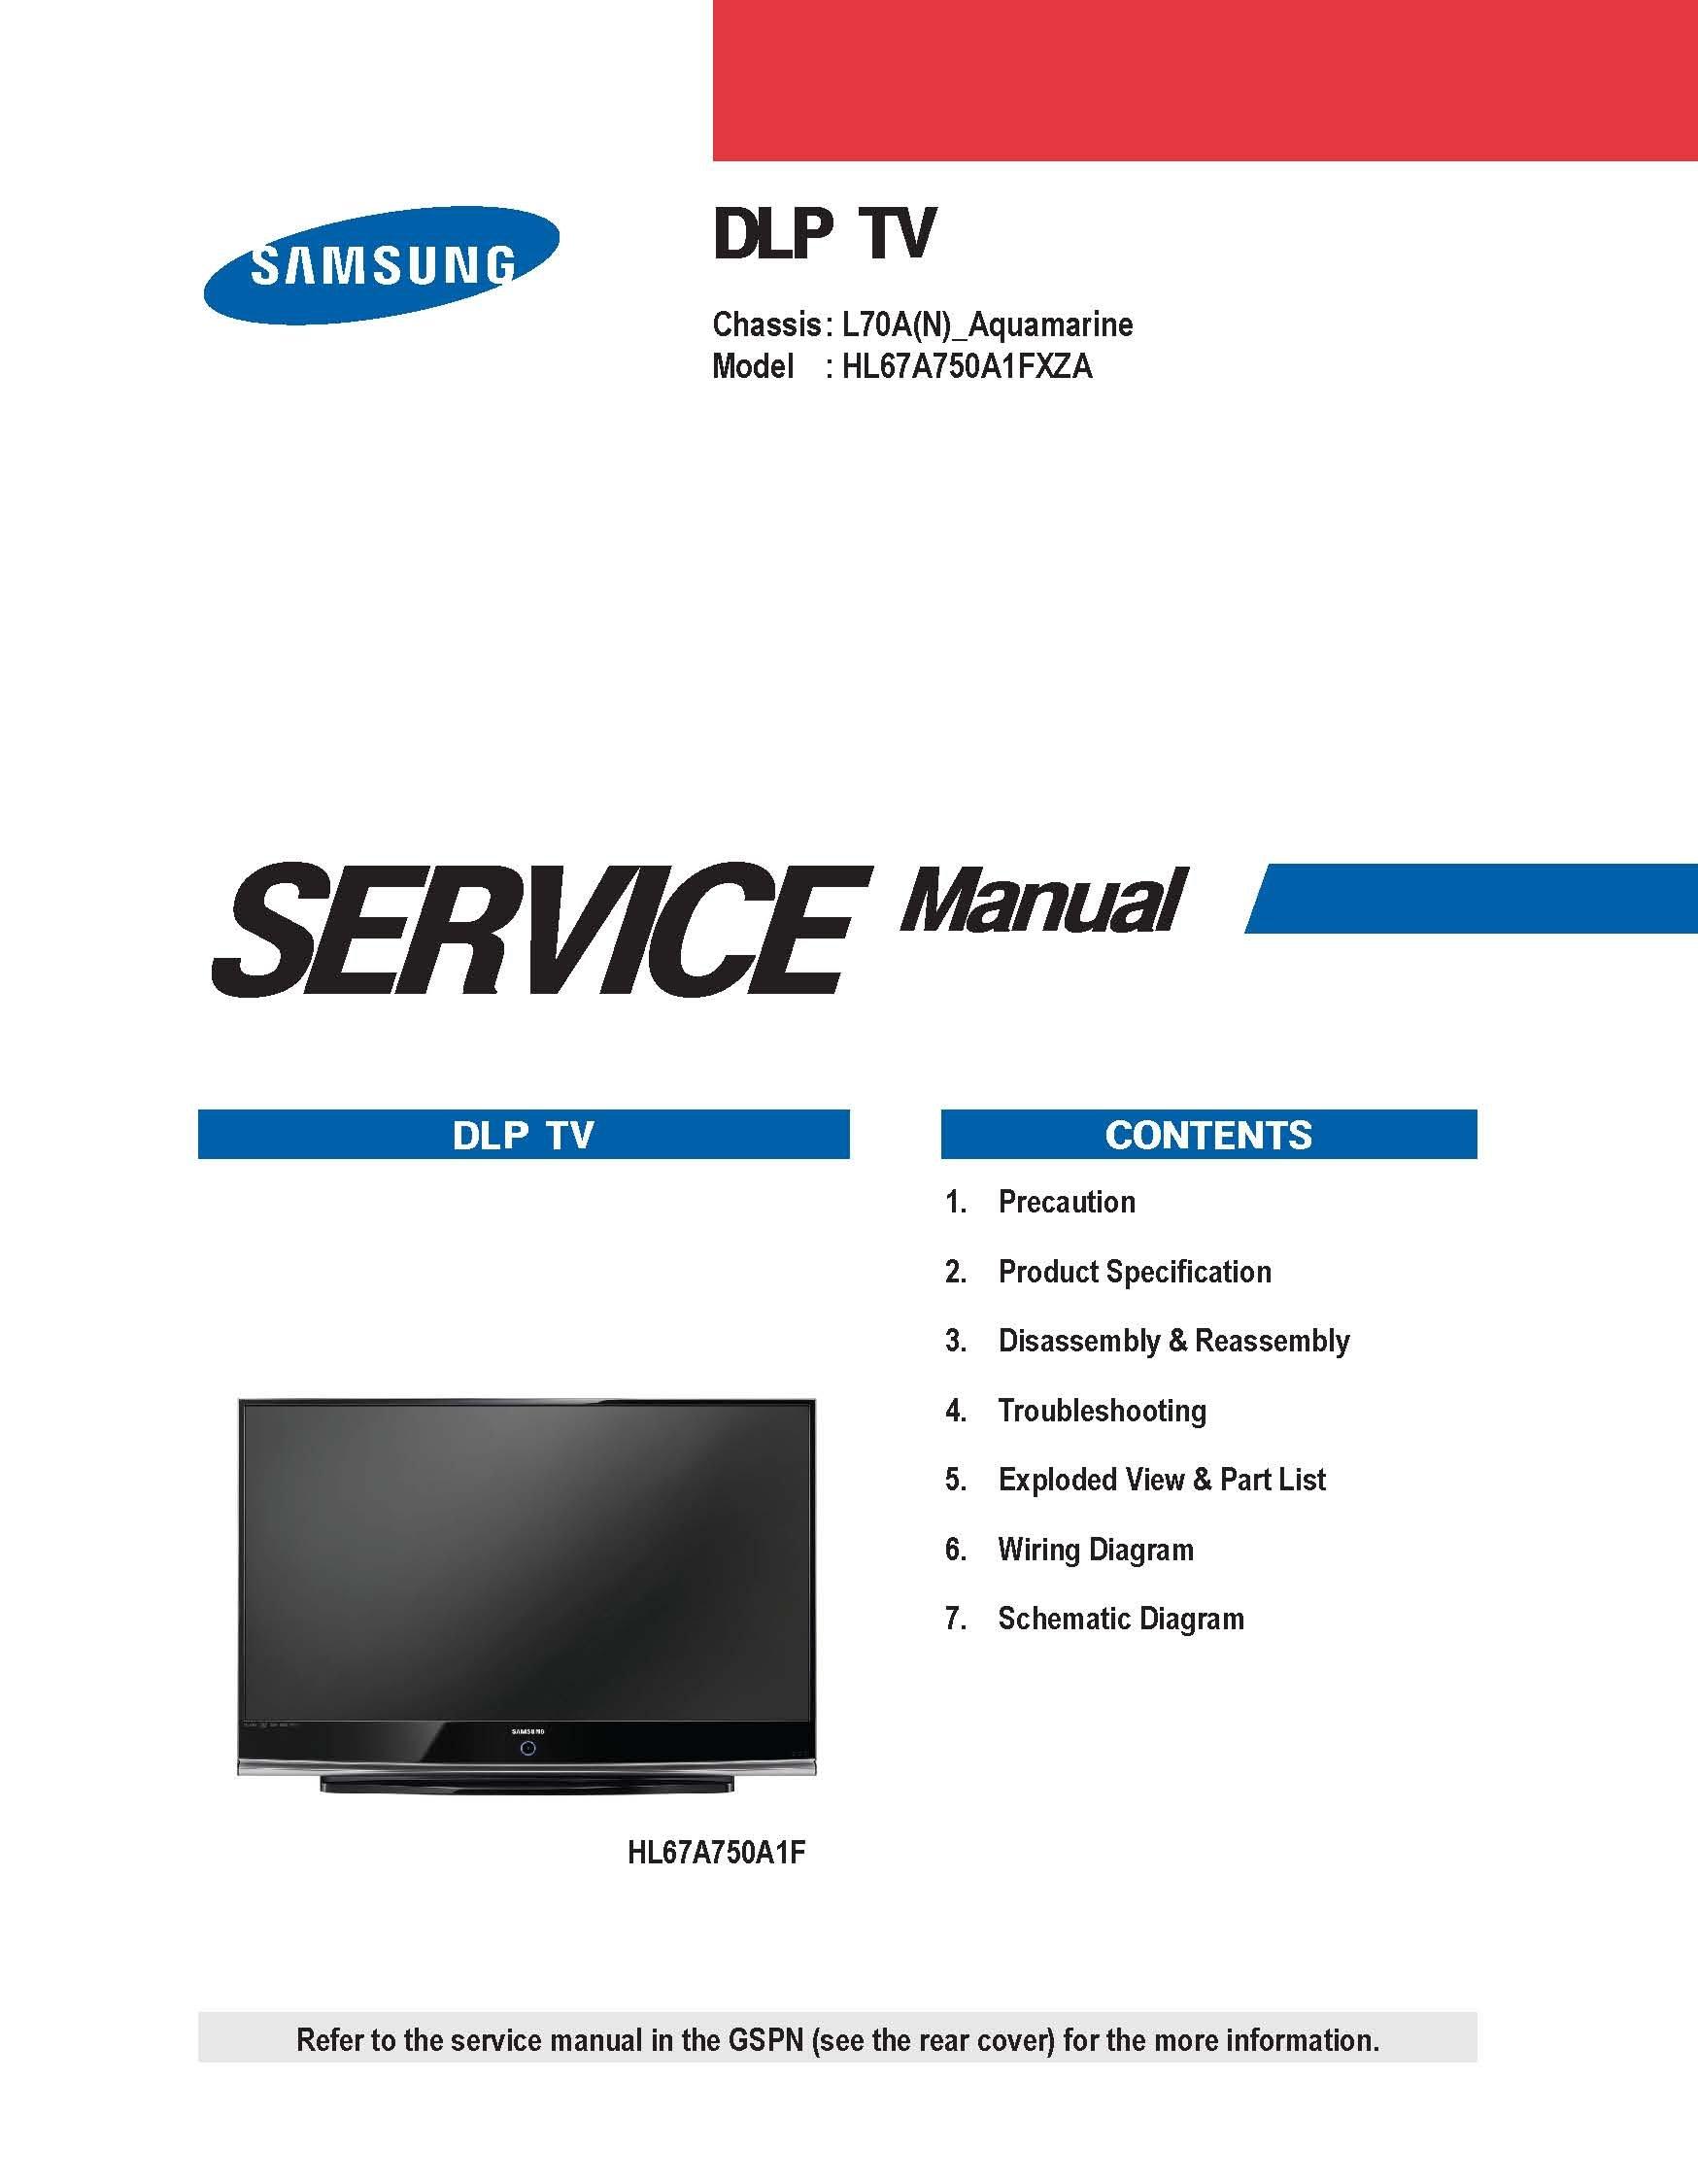 samsung hl67a750a1f hl67a750a1fxzc dlp tv service manual